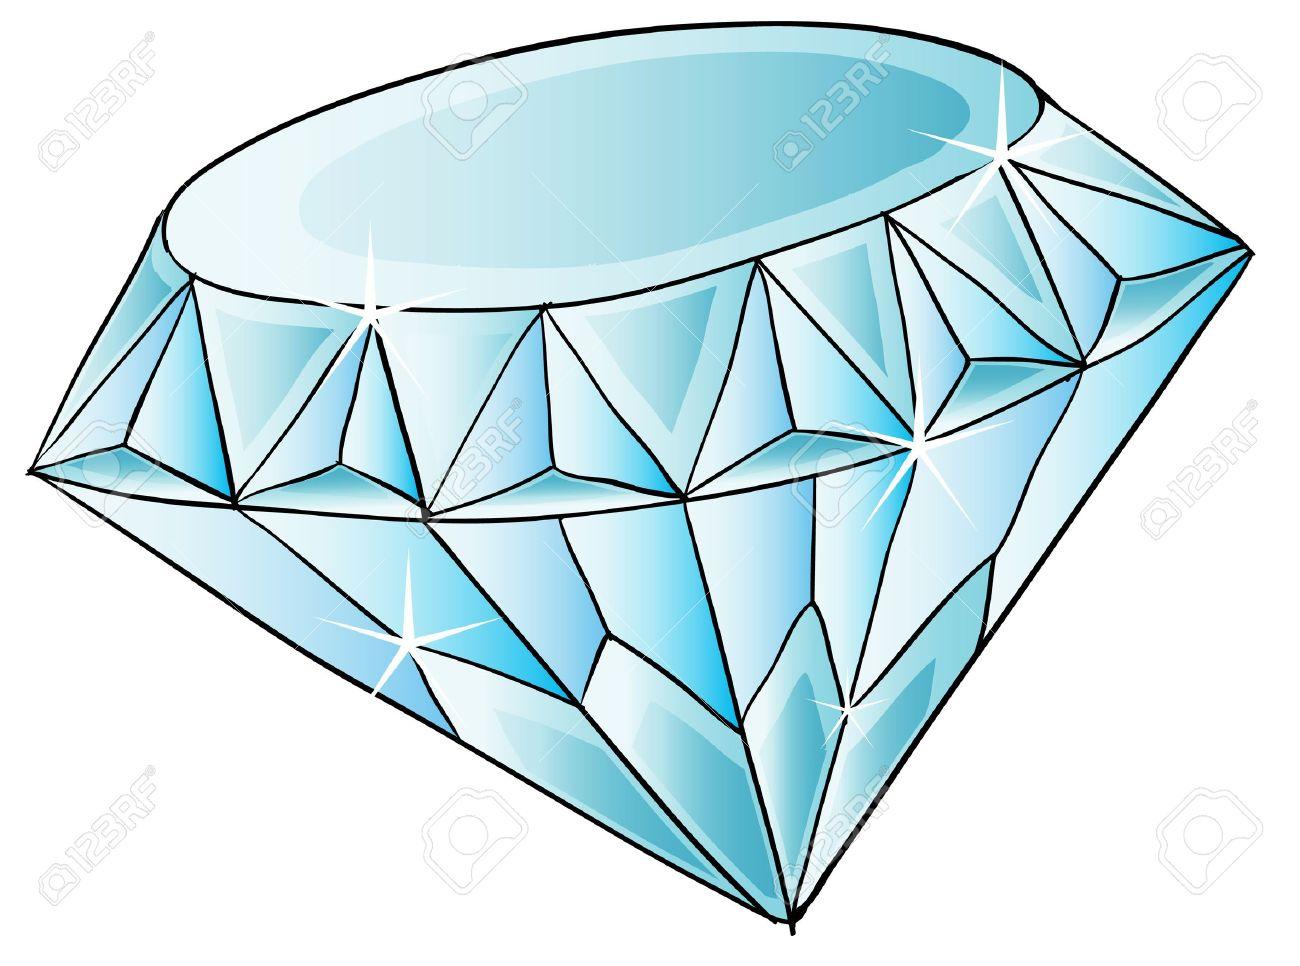 diamonds clip art free clipart panda free clipart images rh clipartpanda com  diamond shapes images clip art